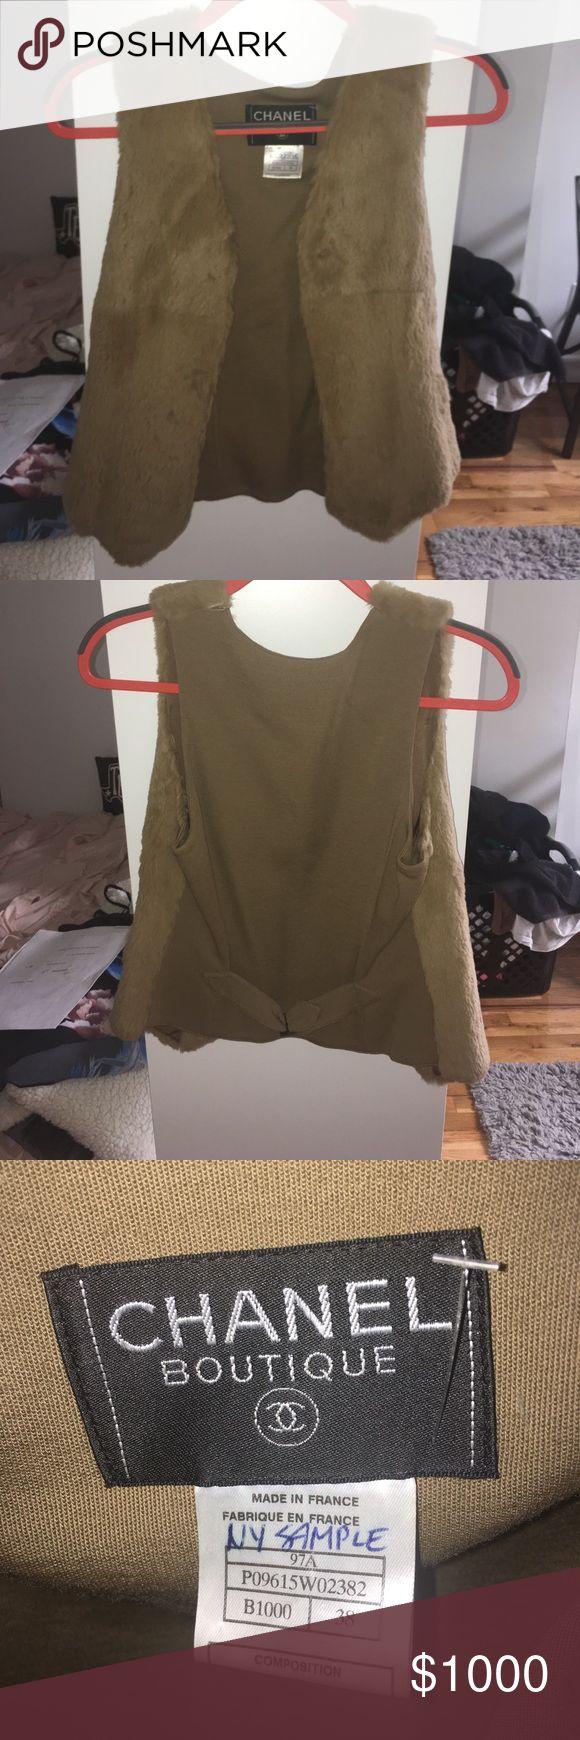 Chanel Rabbit Fur Vest Super soft barely worn Chanel rabbit fur vest CHANEL Jackets & Coats Vests